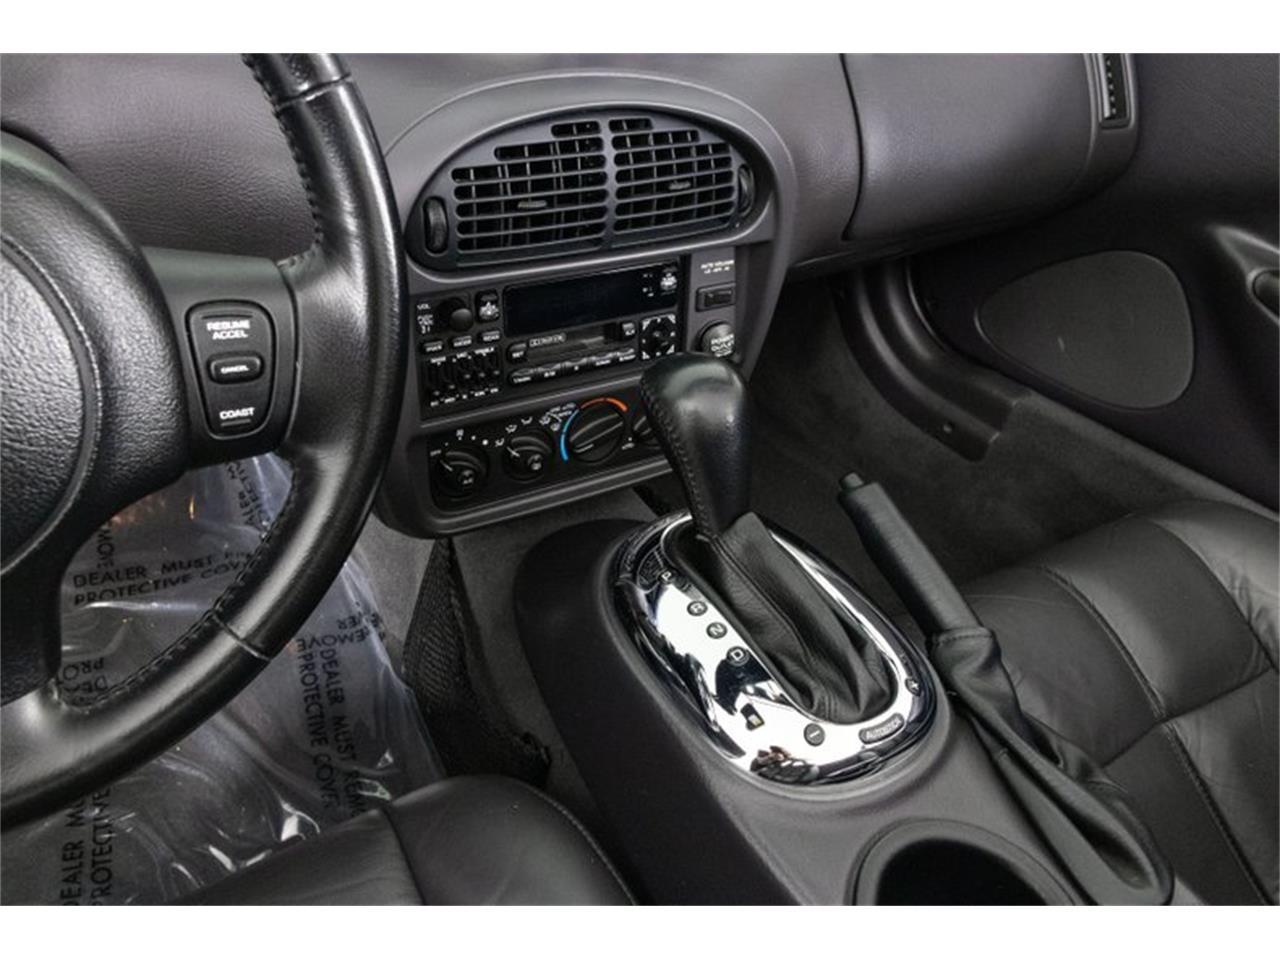 2001 Chrysler Prowler (CC-1415510) for sale in St. Charles, Missouri